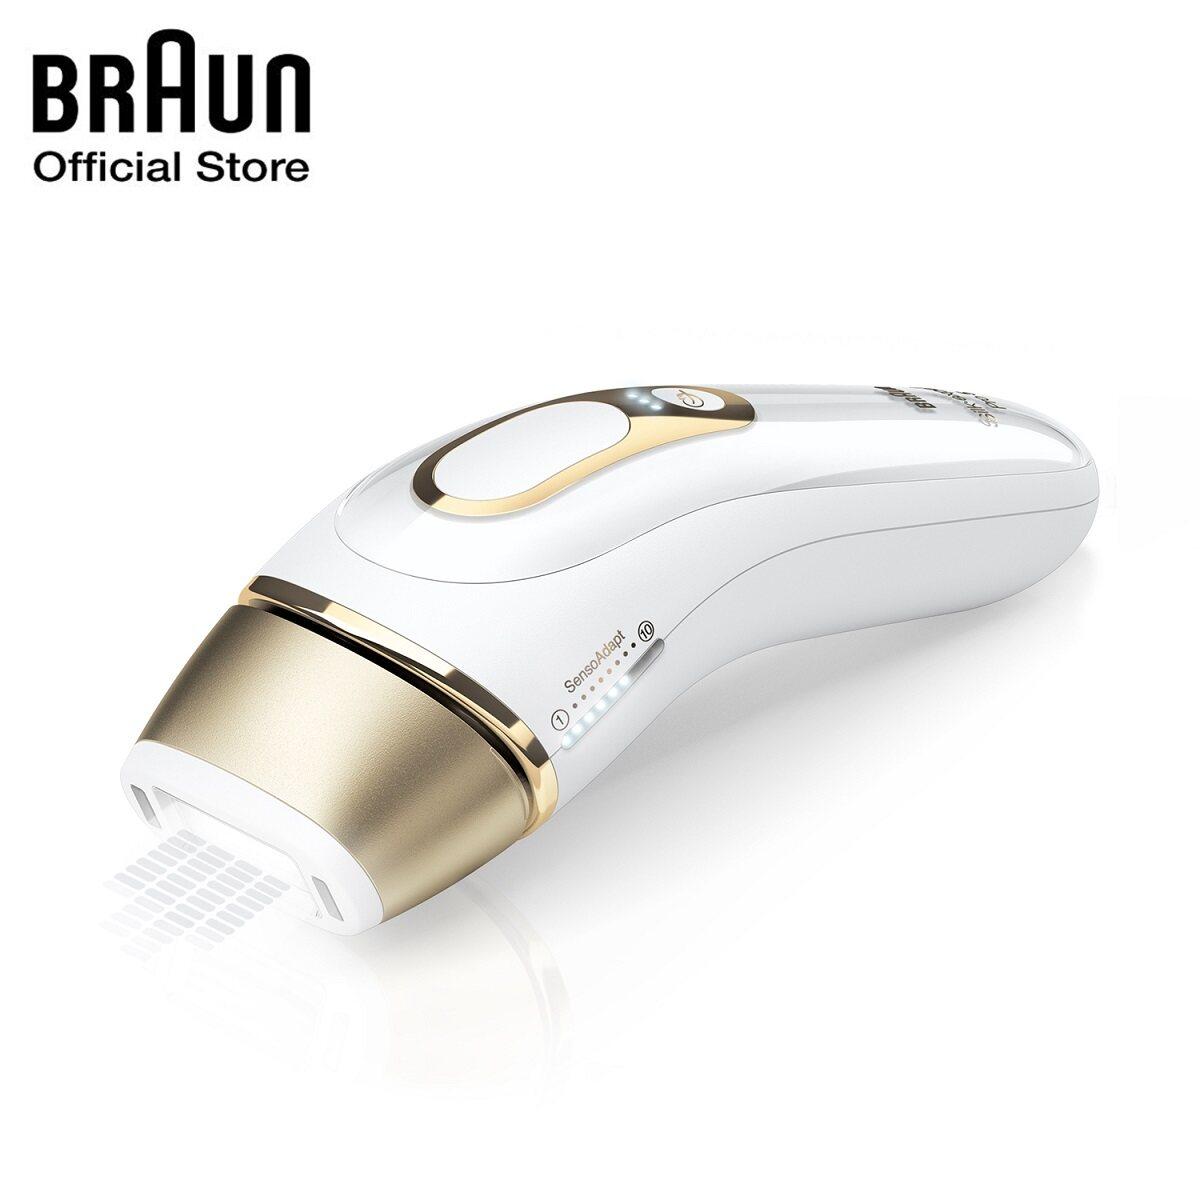 Braun เครื่องกำจัดขน Ipl รุ่น Pl5014.